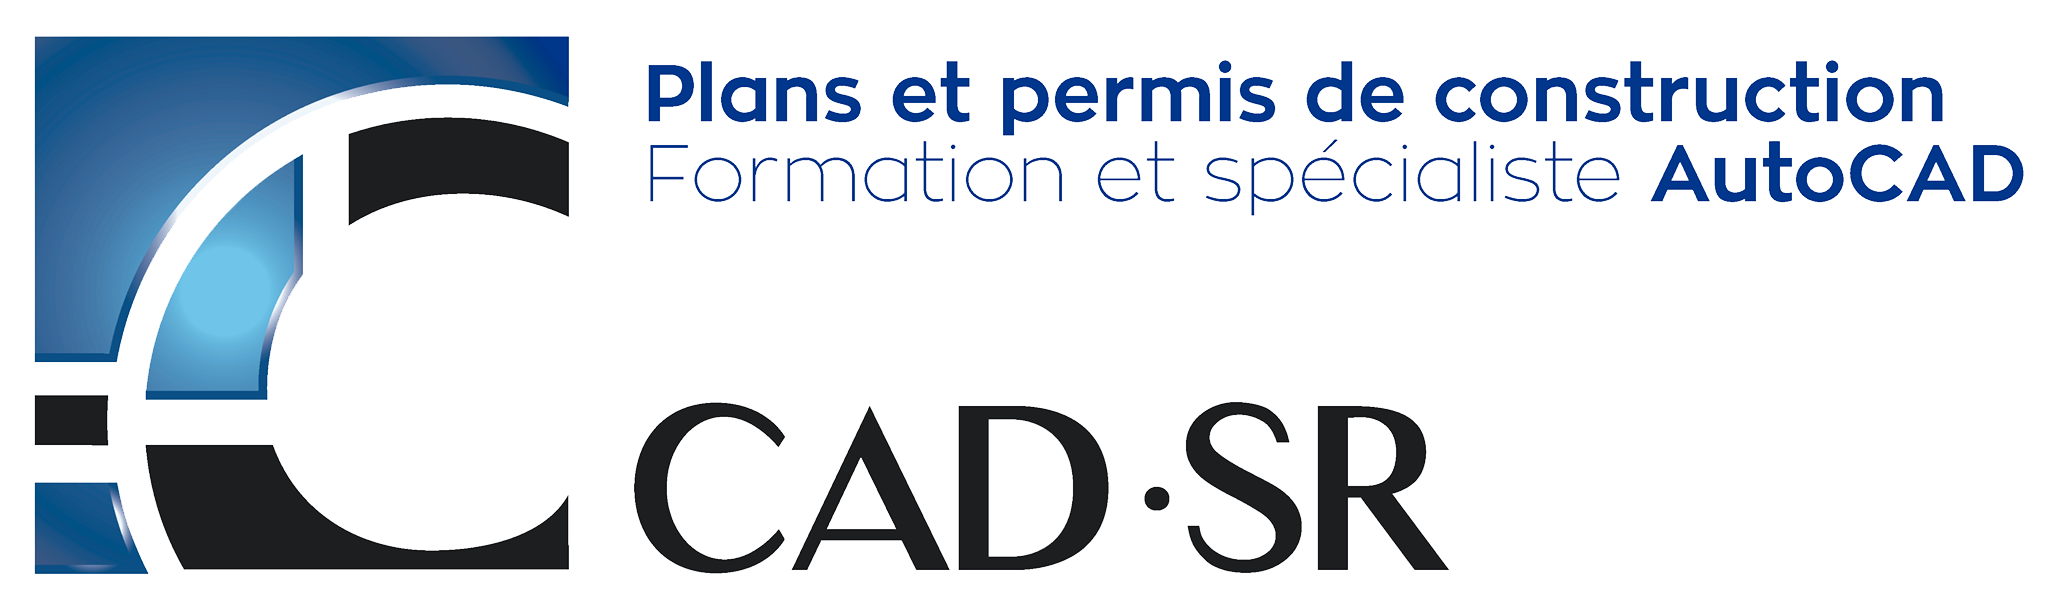 Stéphanie Racine (CAD-SR) Spécialiste AutoCAD